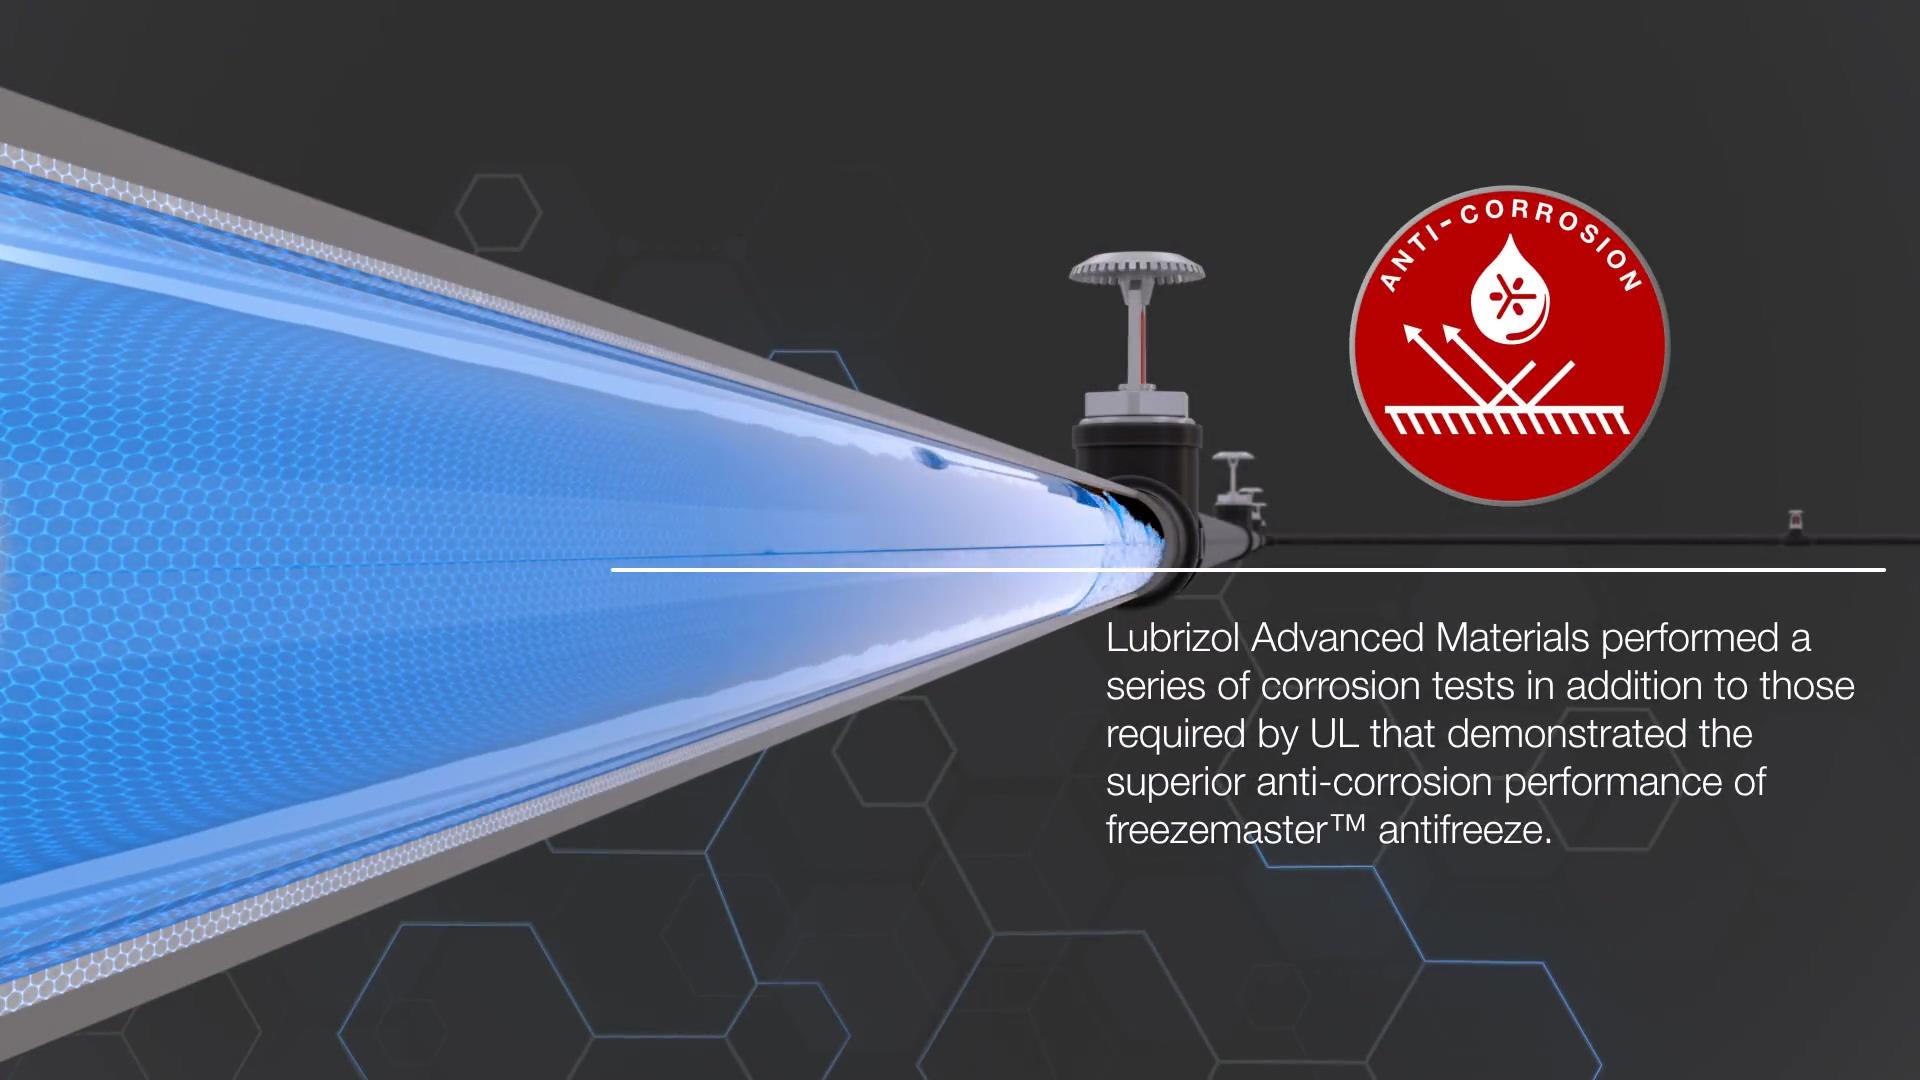 Advantages_of_Freezemaster_Antifreeze_MAR25